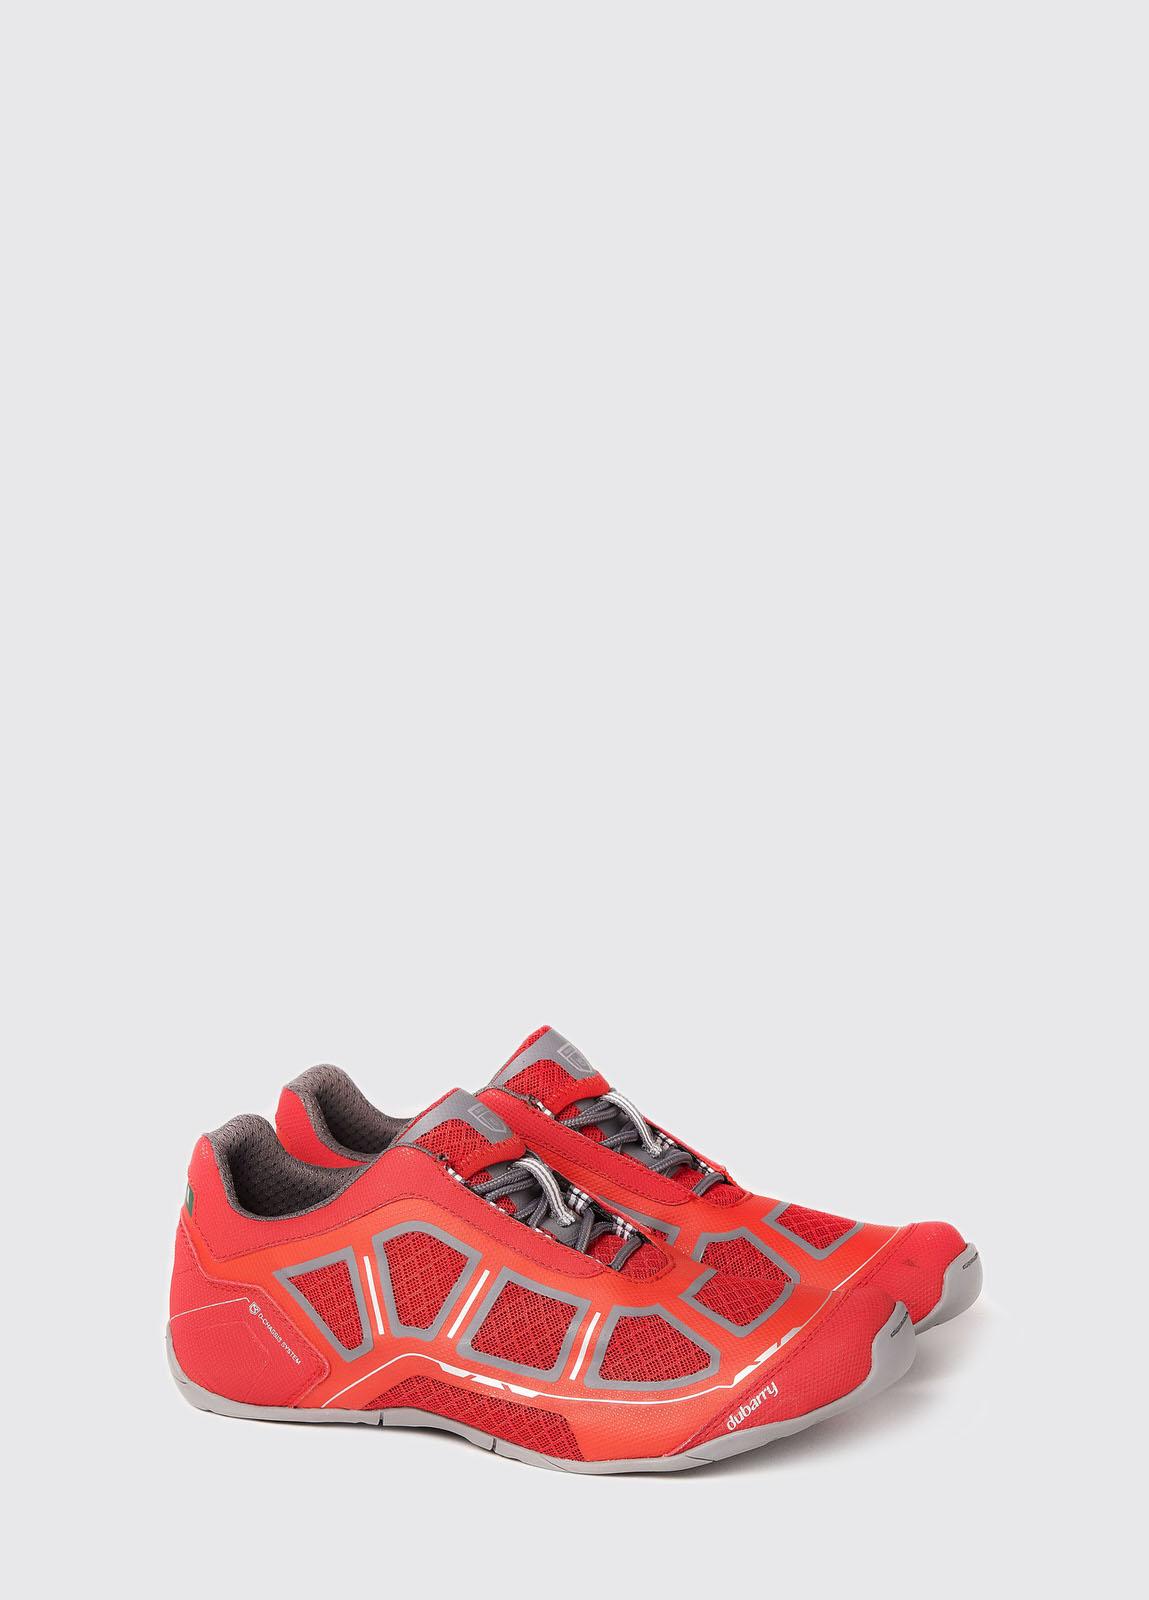 Easkey Sailing Shoe - Red